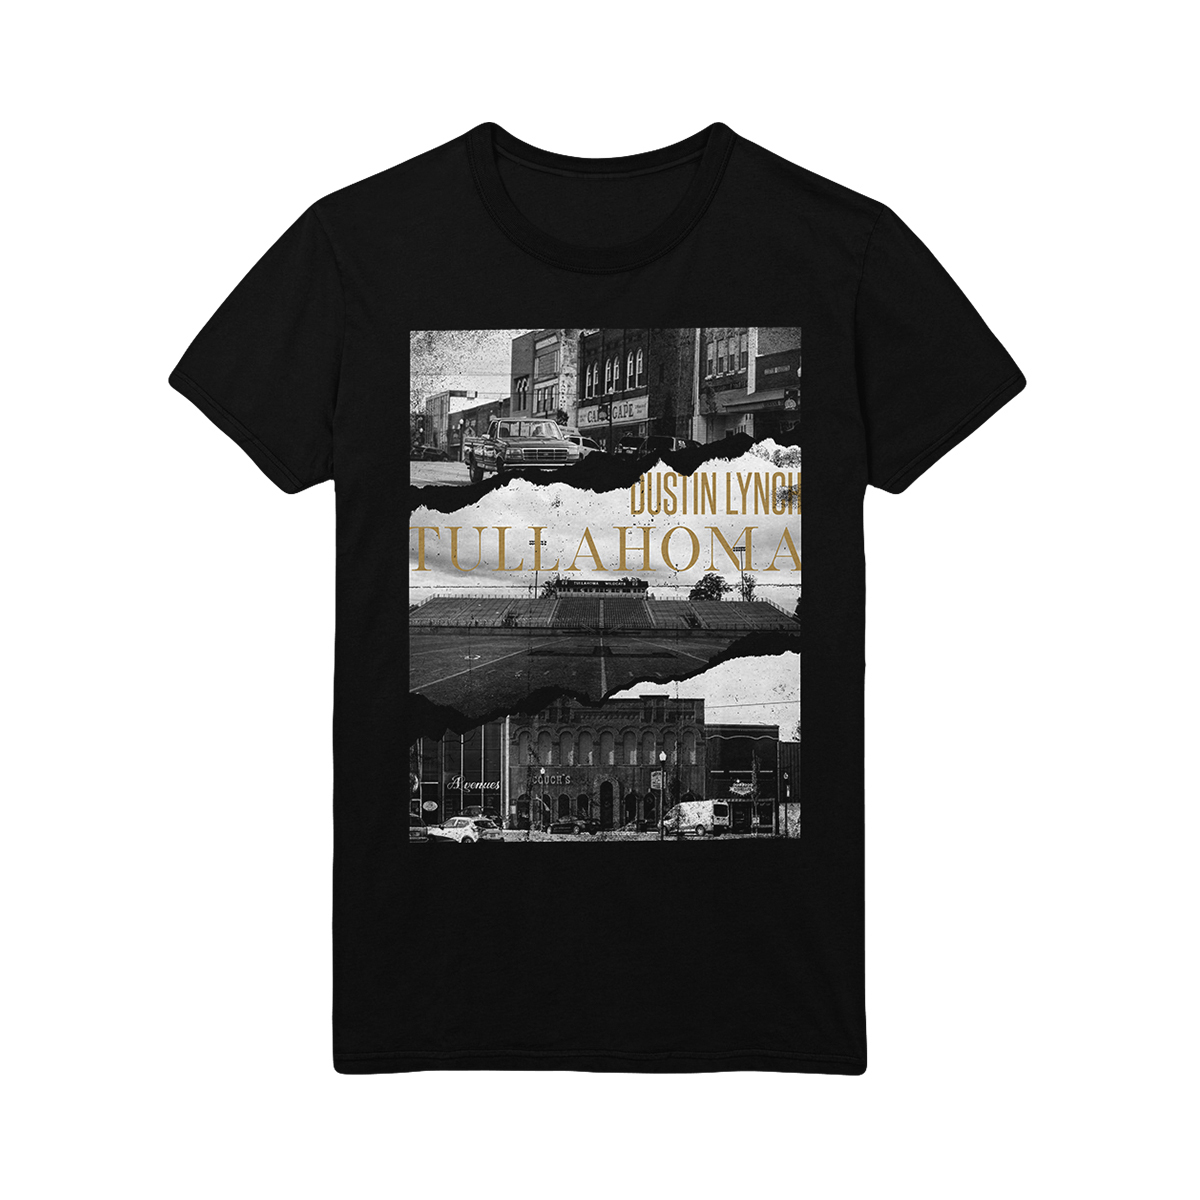 Tullahoma Photo T-shirt